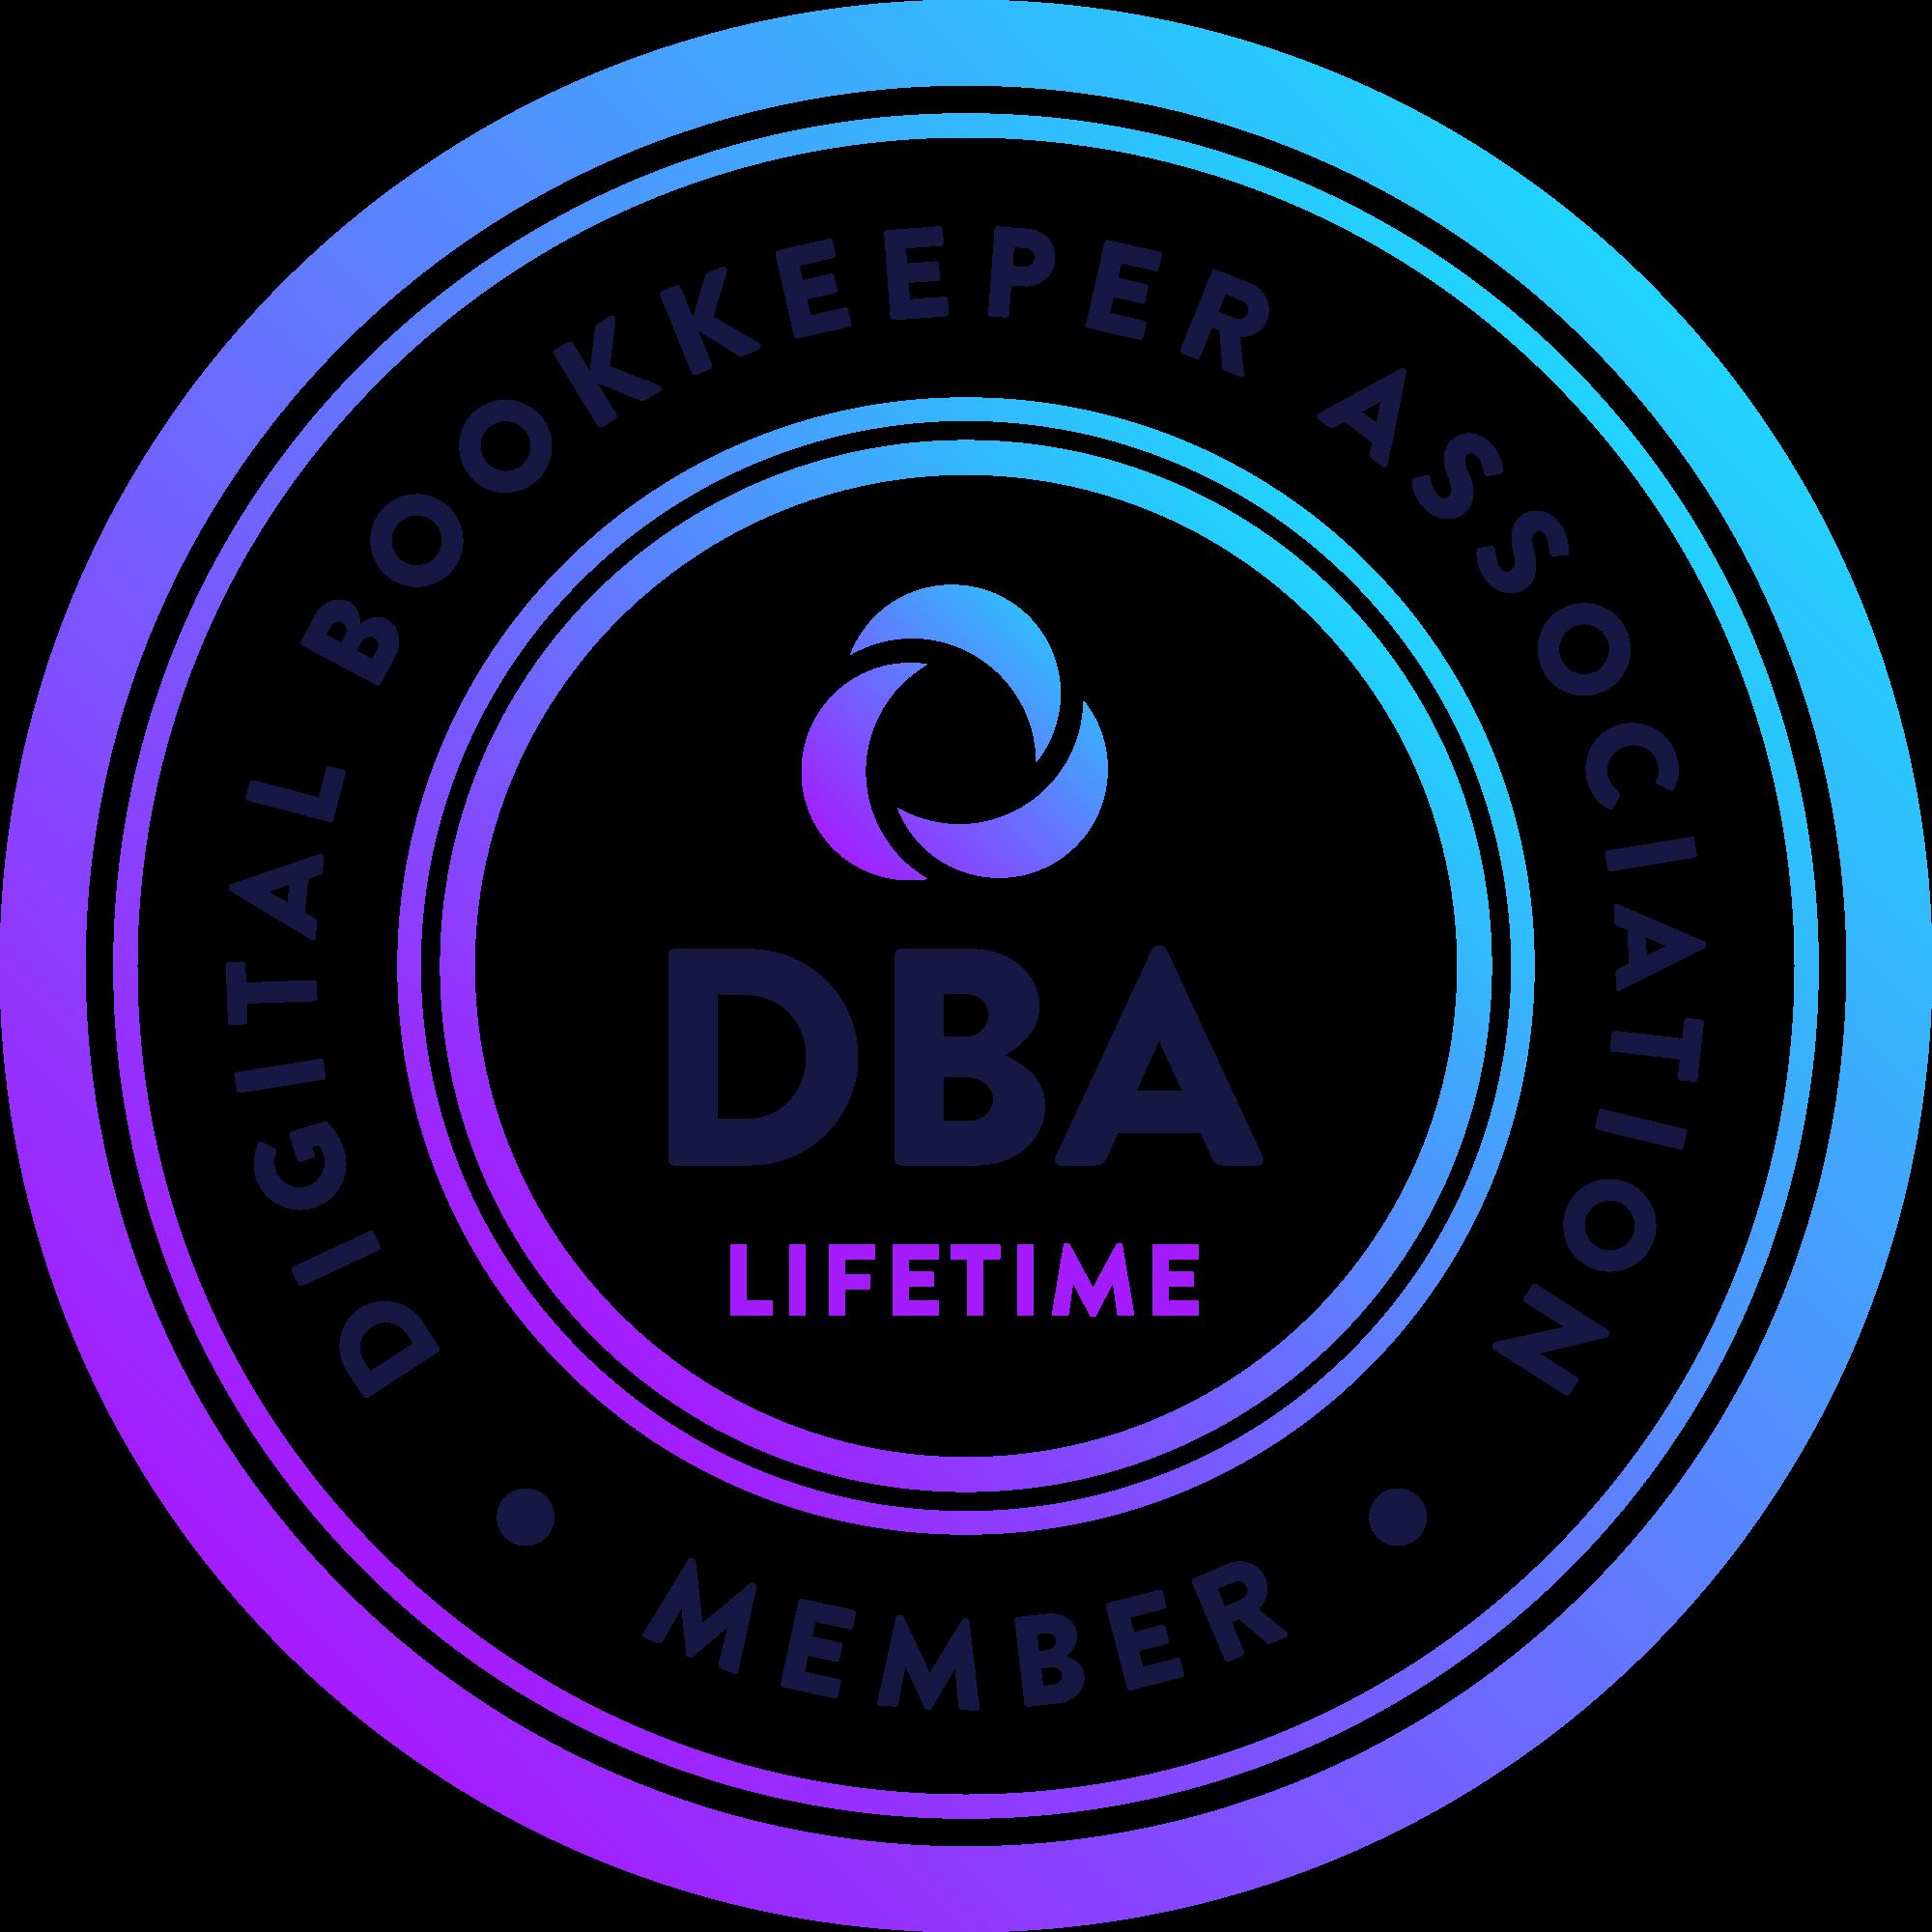 Digital Bookkeeper Association Lifetime Member